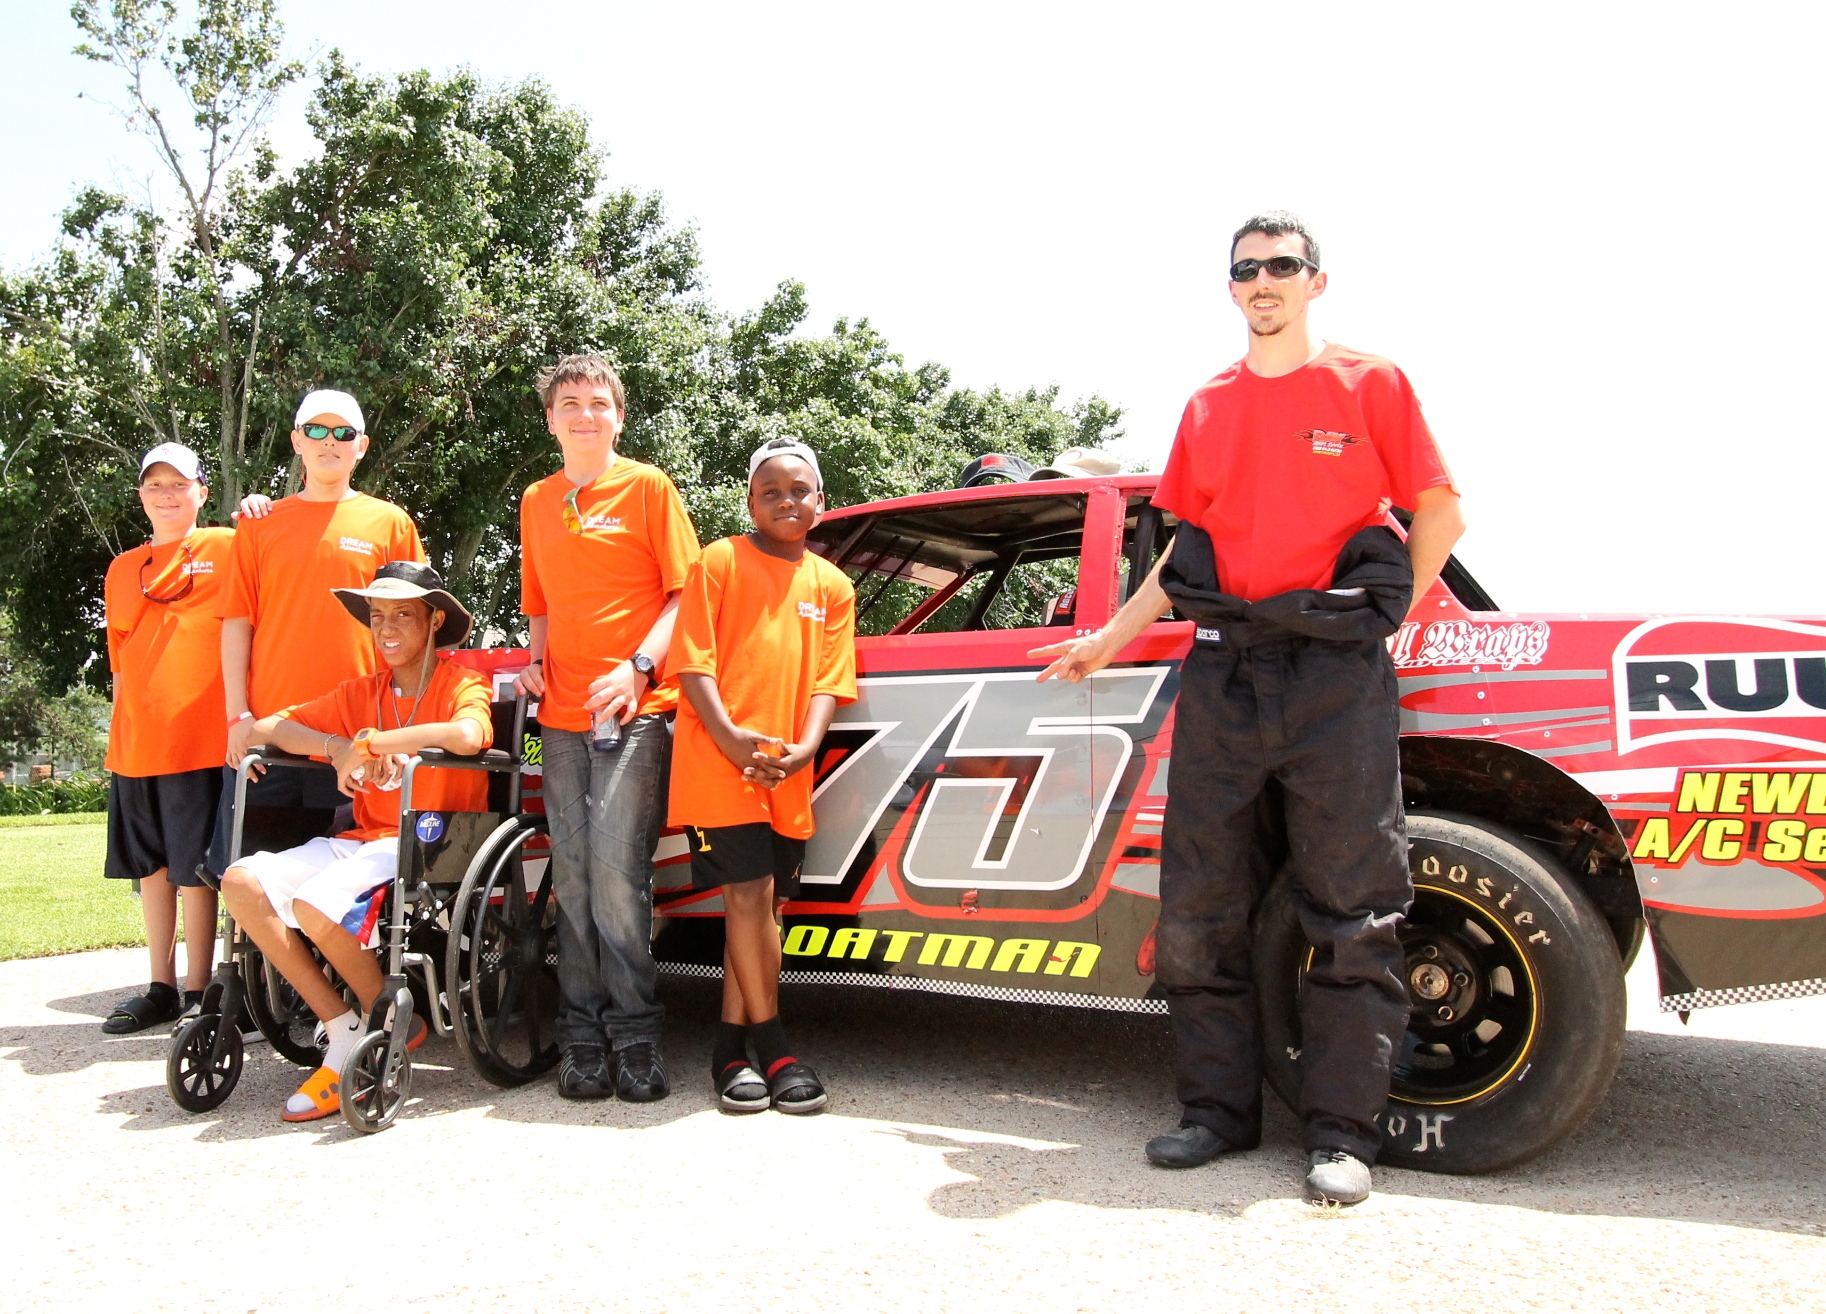 The Pit Crew with Wes, JJ, Dustyn, Joseph & Denver